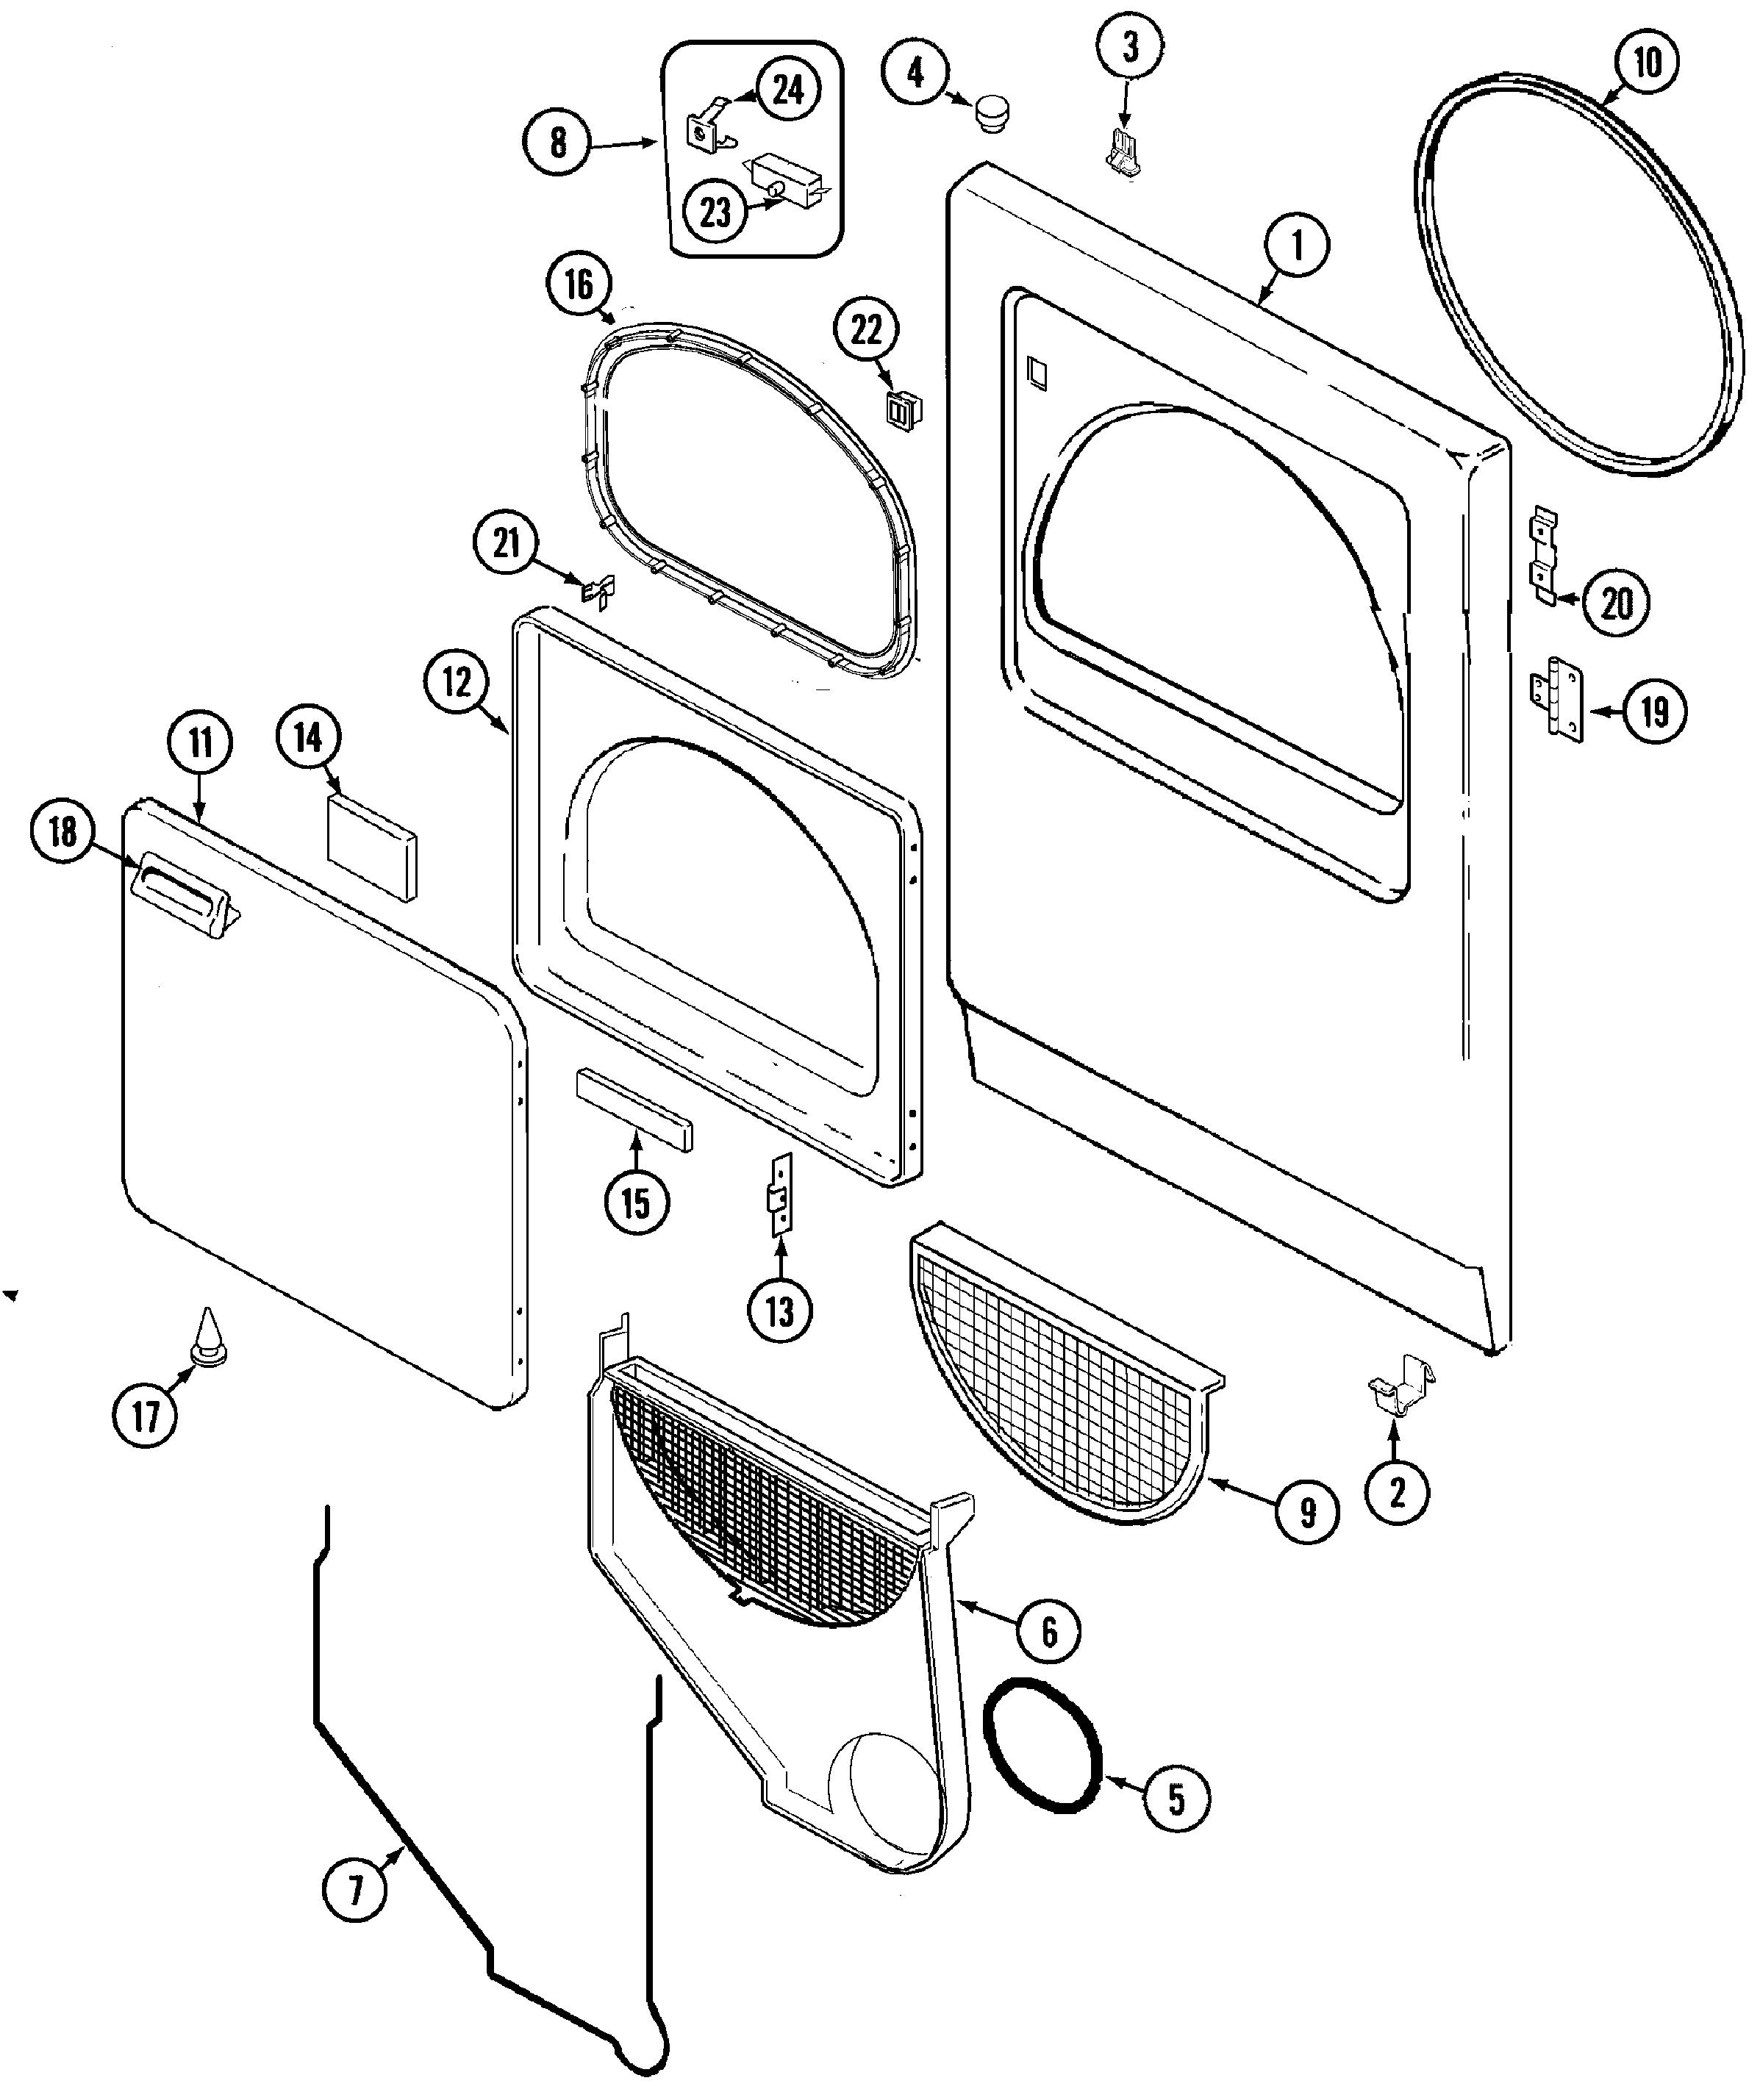 admiral dryer wiring diagram Download-Admiral Dryer Parts Diagram 19-e